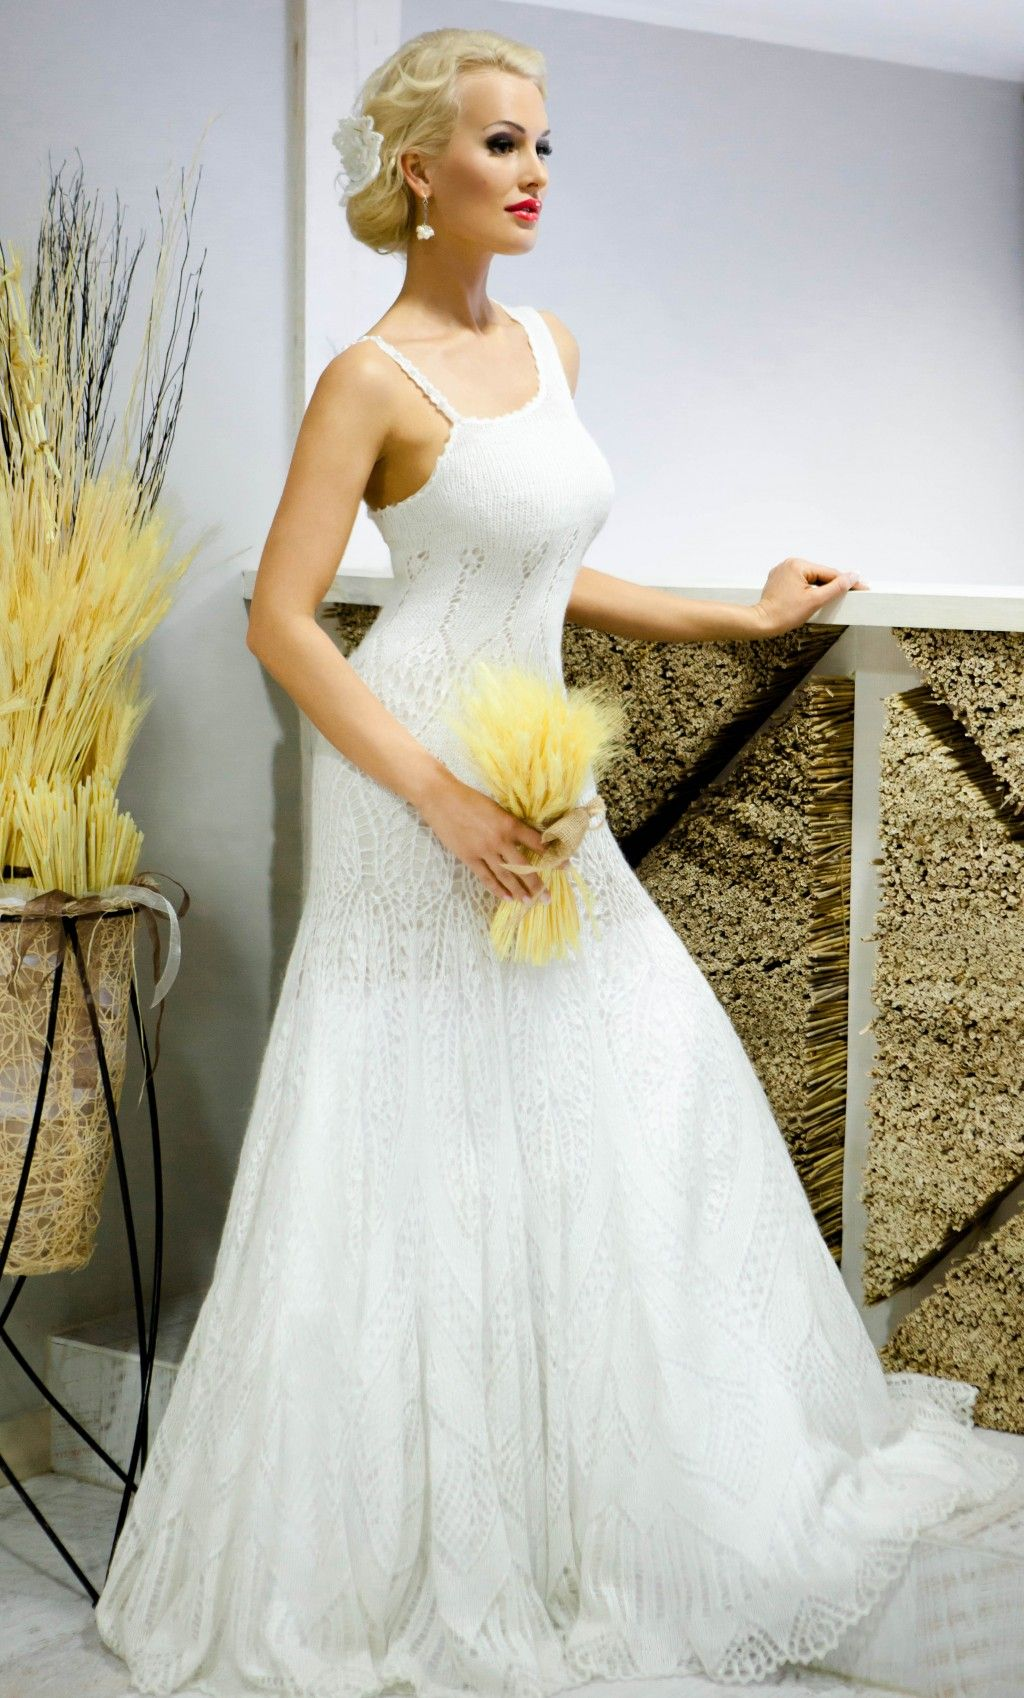 Crochet wedding dresses unique weddings wedding dress and wedding